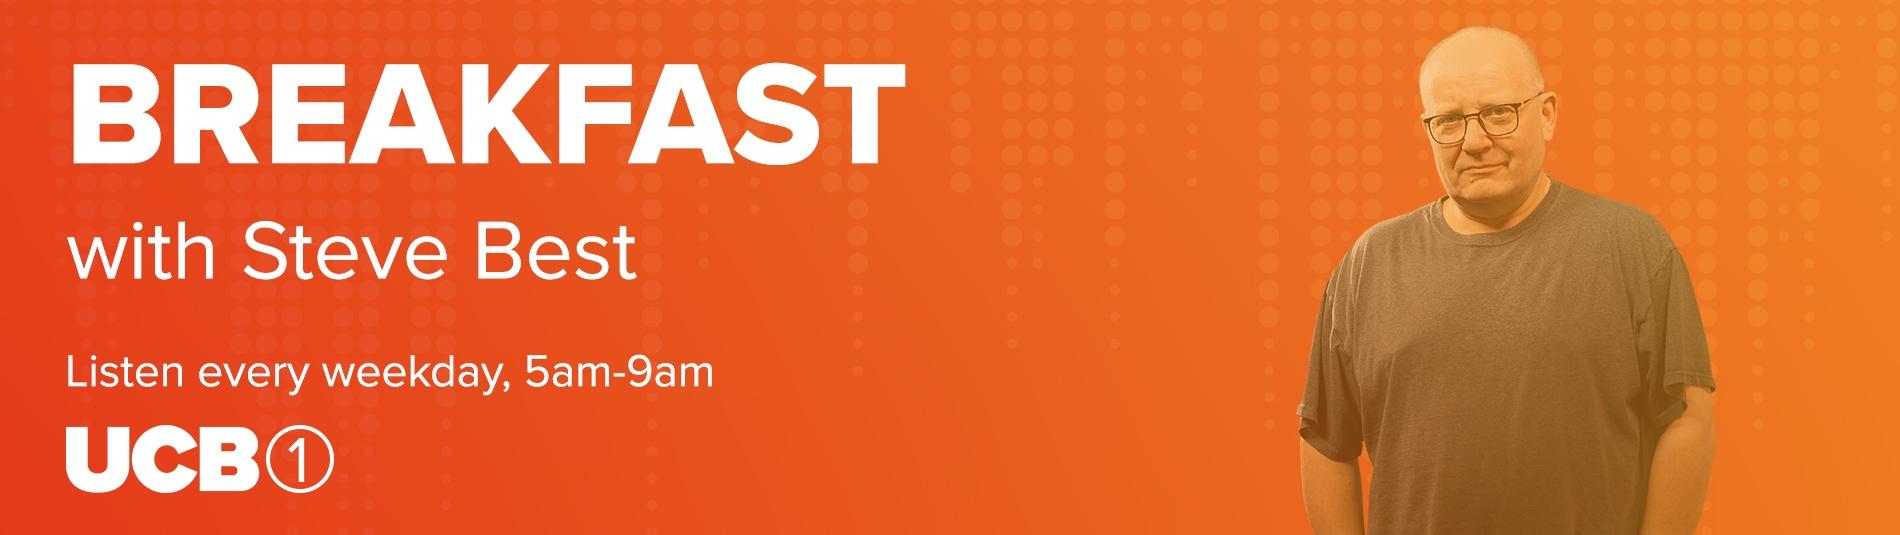 Breakfast with Steve Best - Listen 5am-9am UCB1